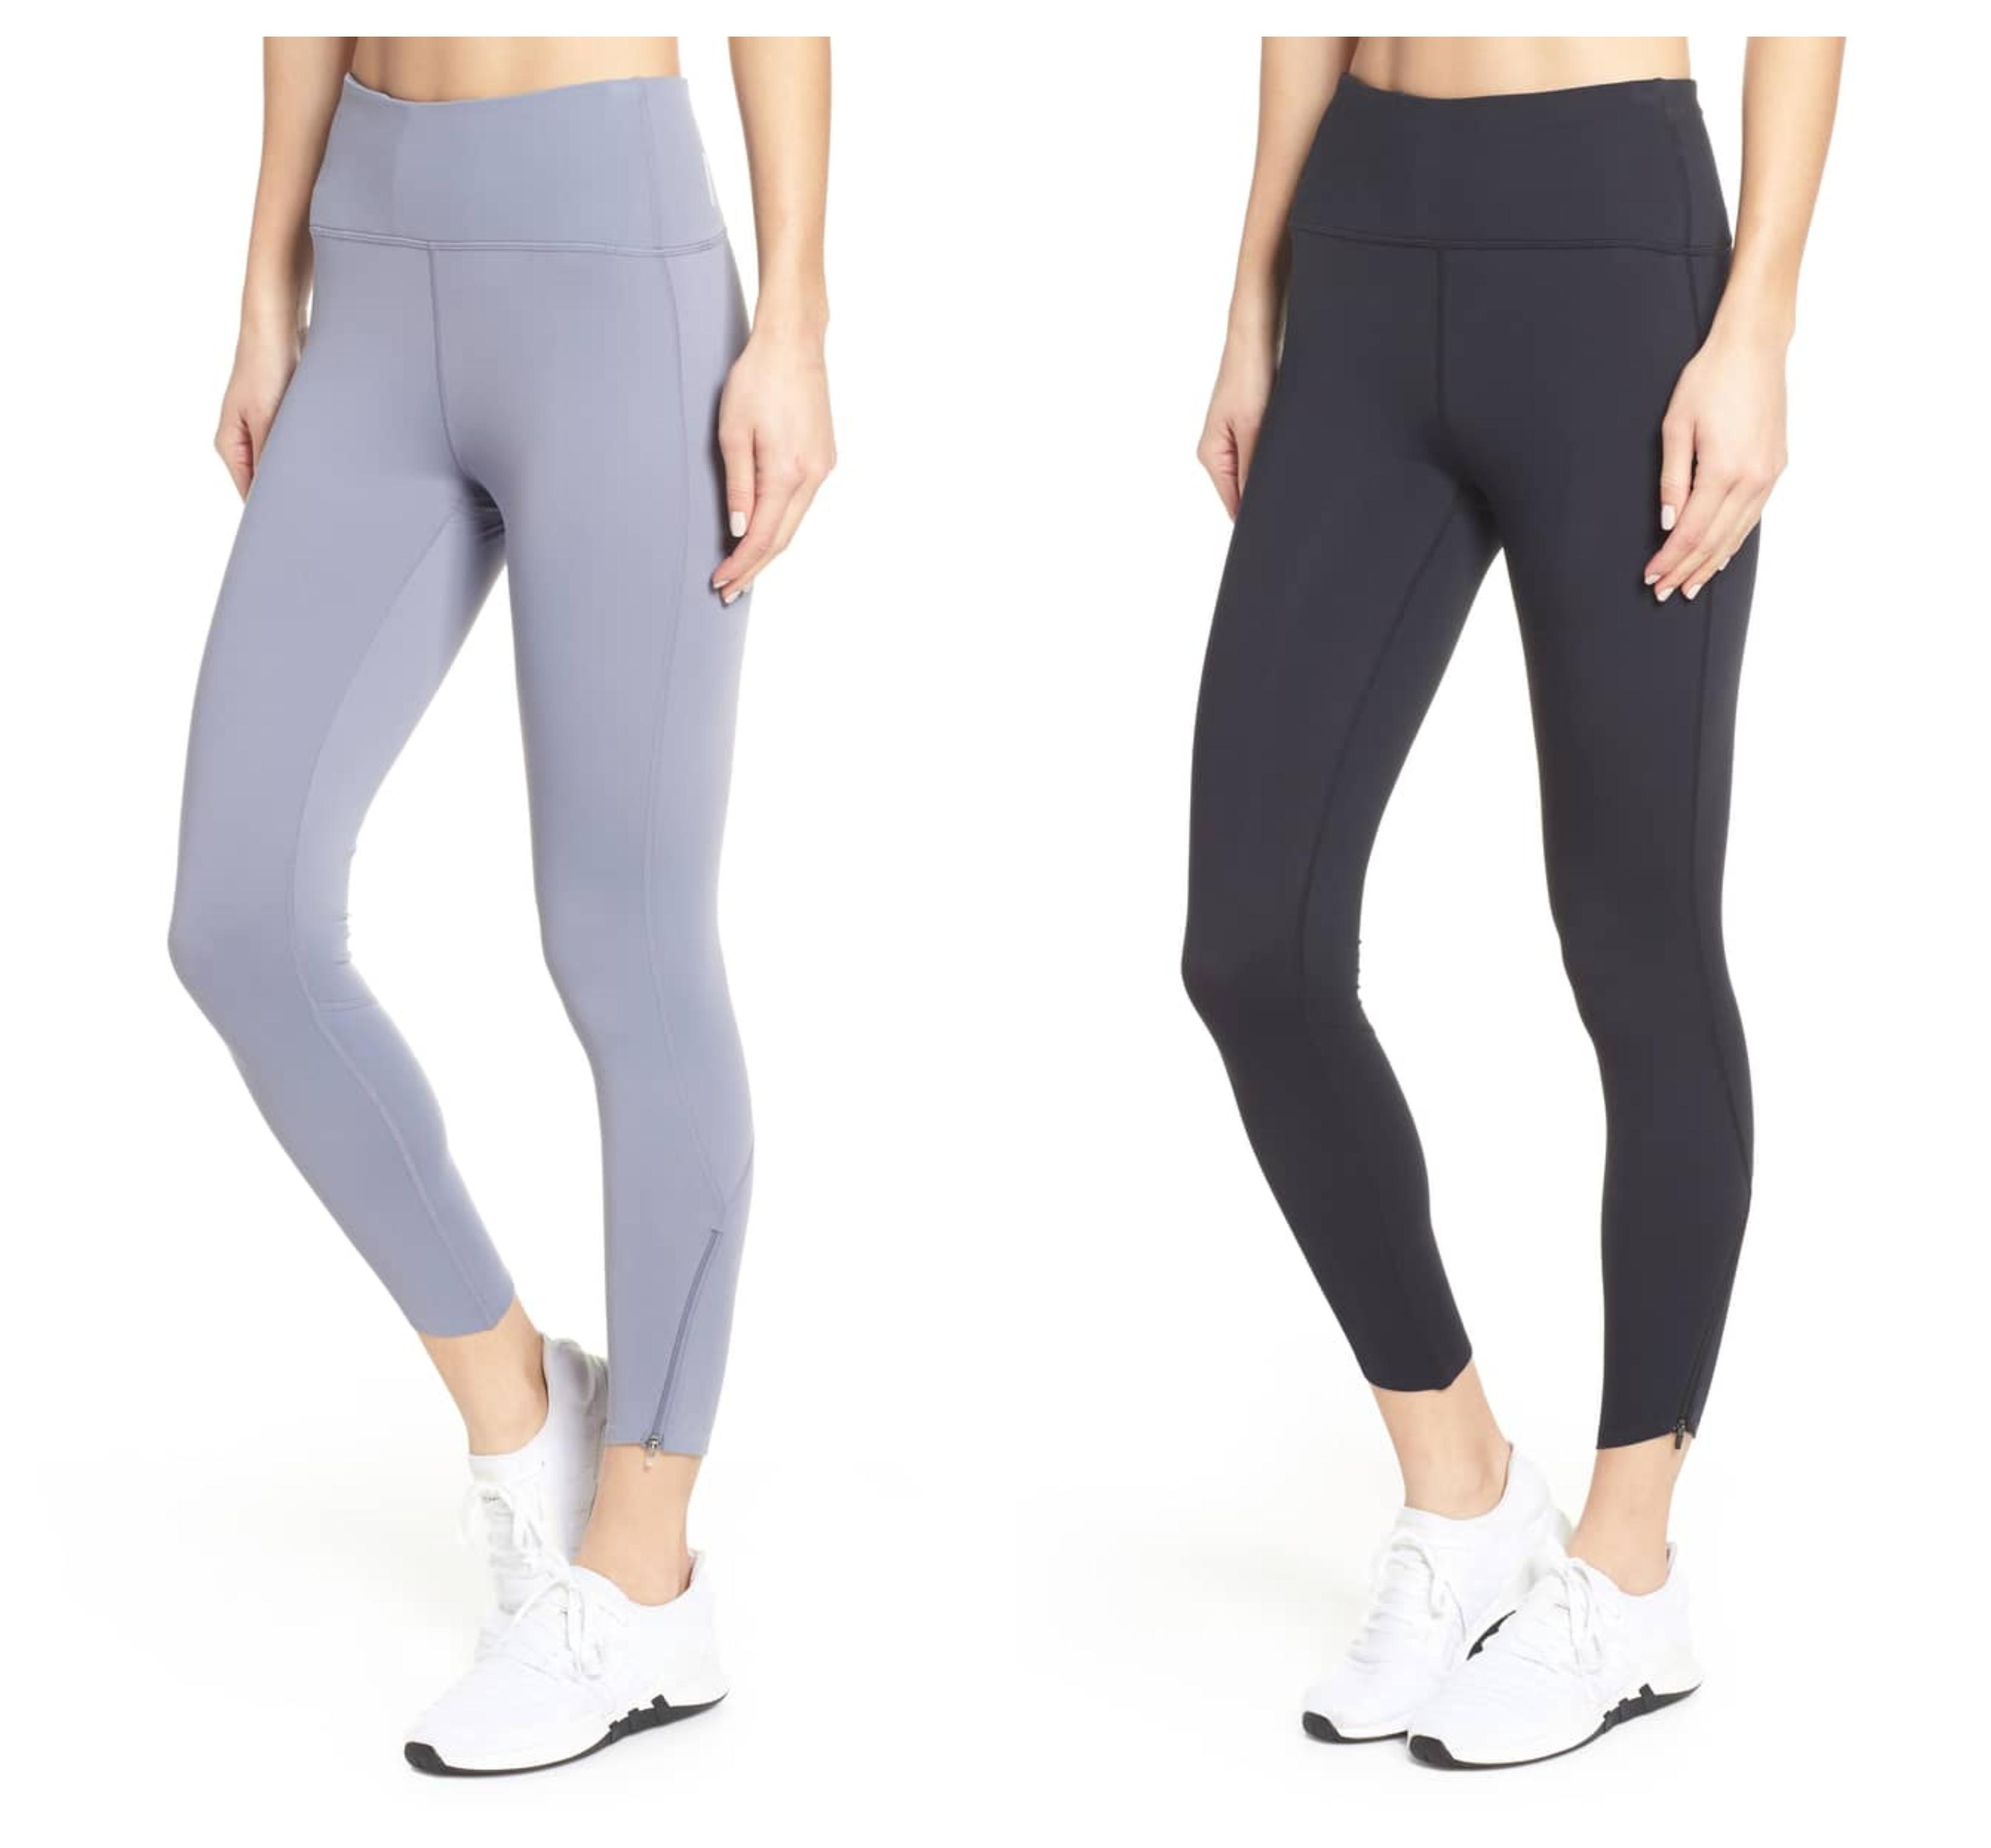 e22c74ec53a10 Nordstrom: 40% Off Zella Leggings + MORE! – Wear It For Less